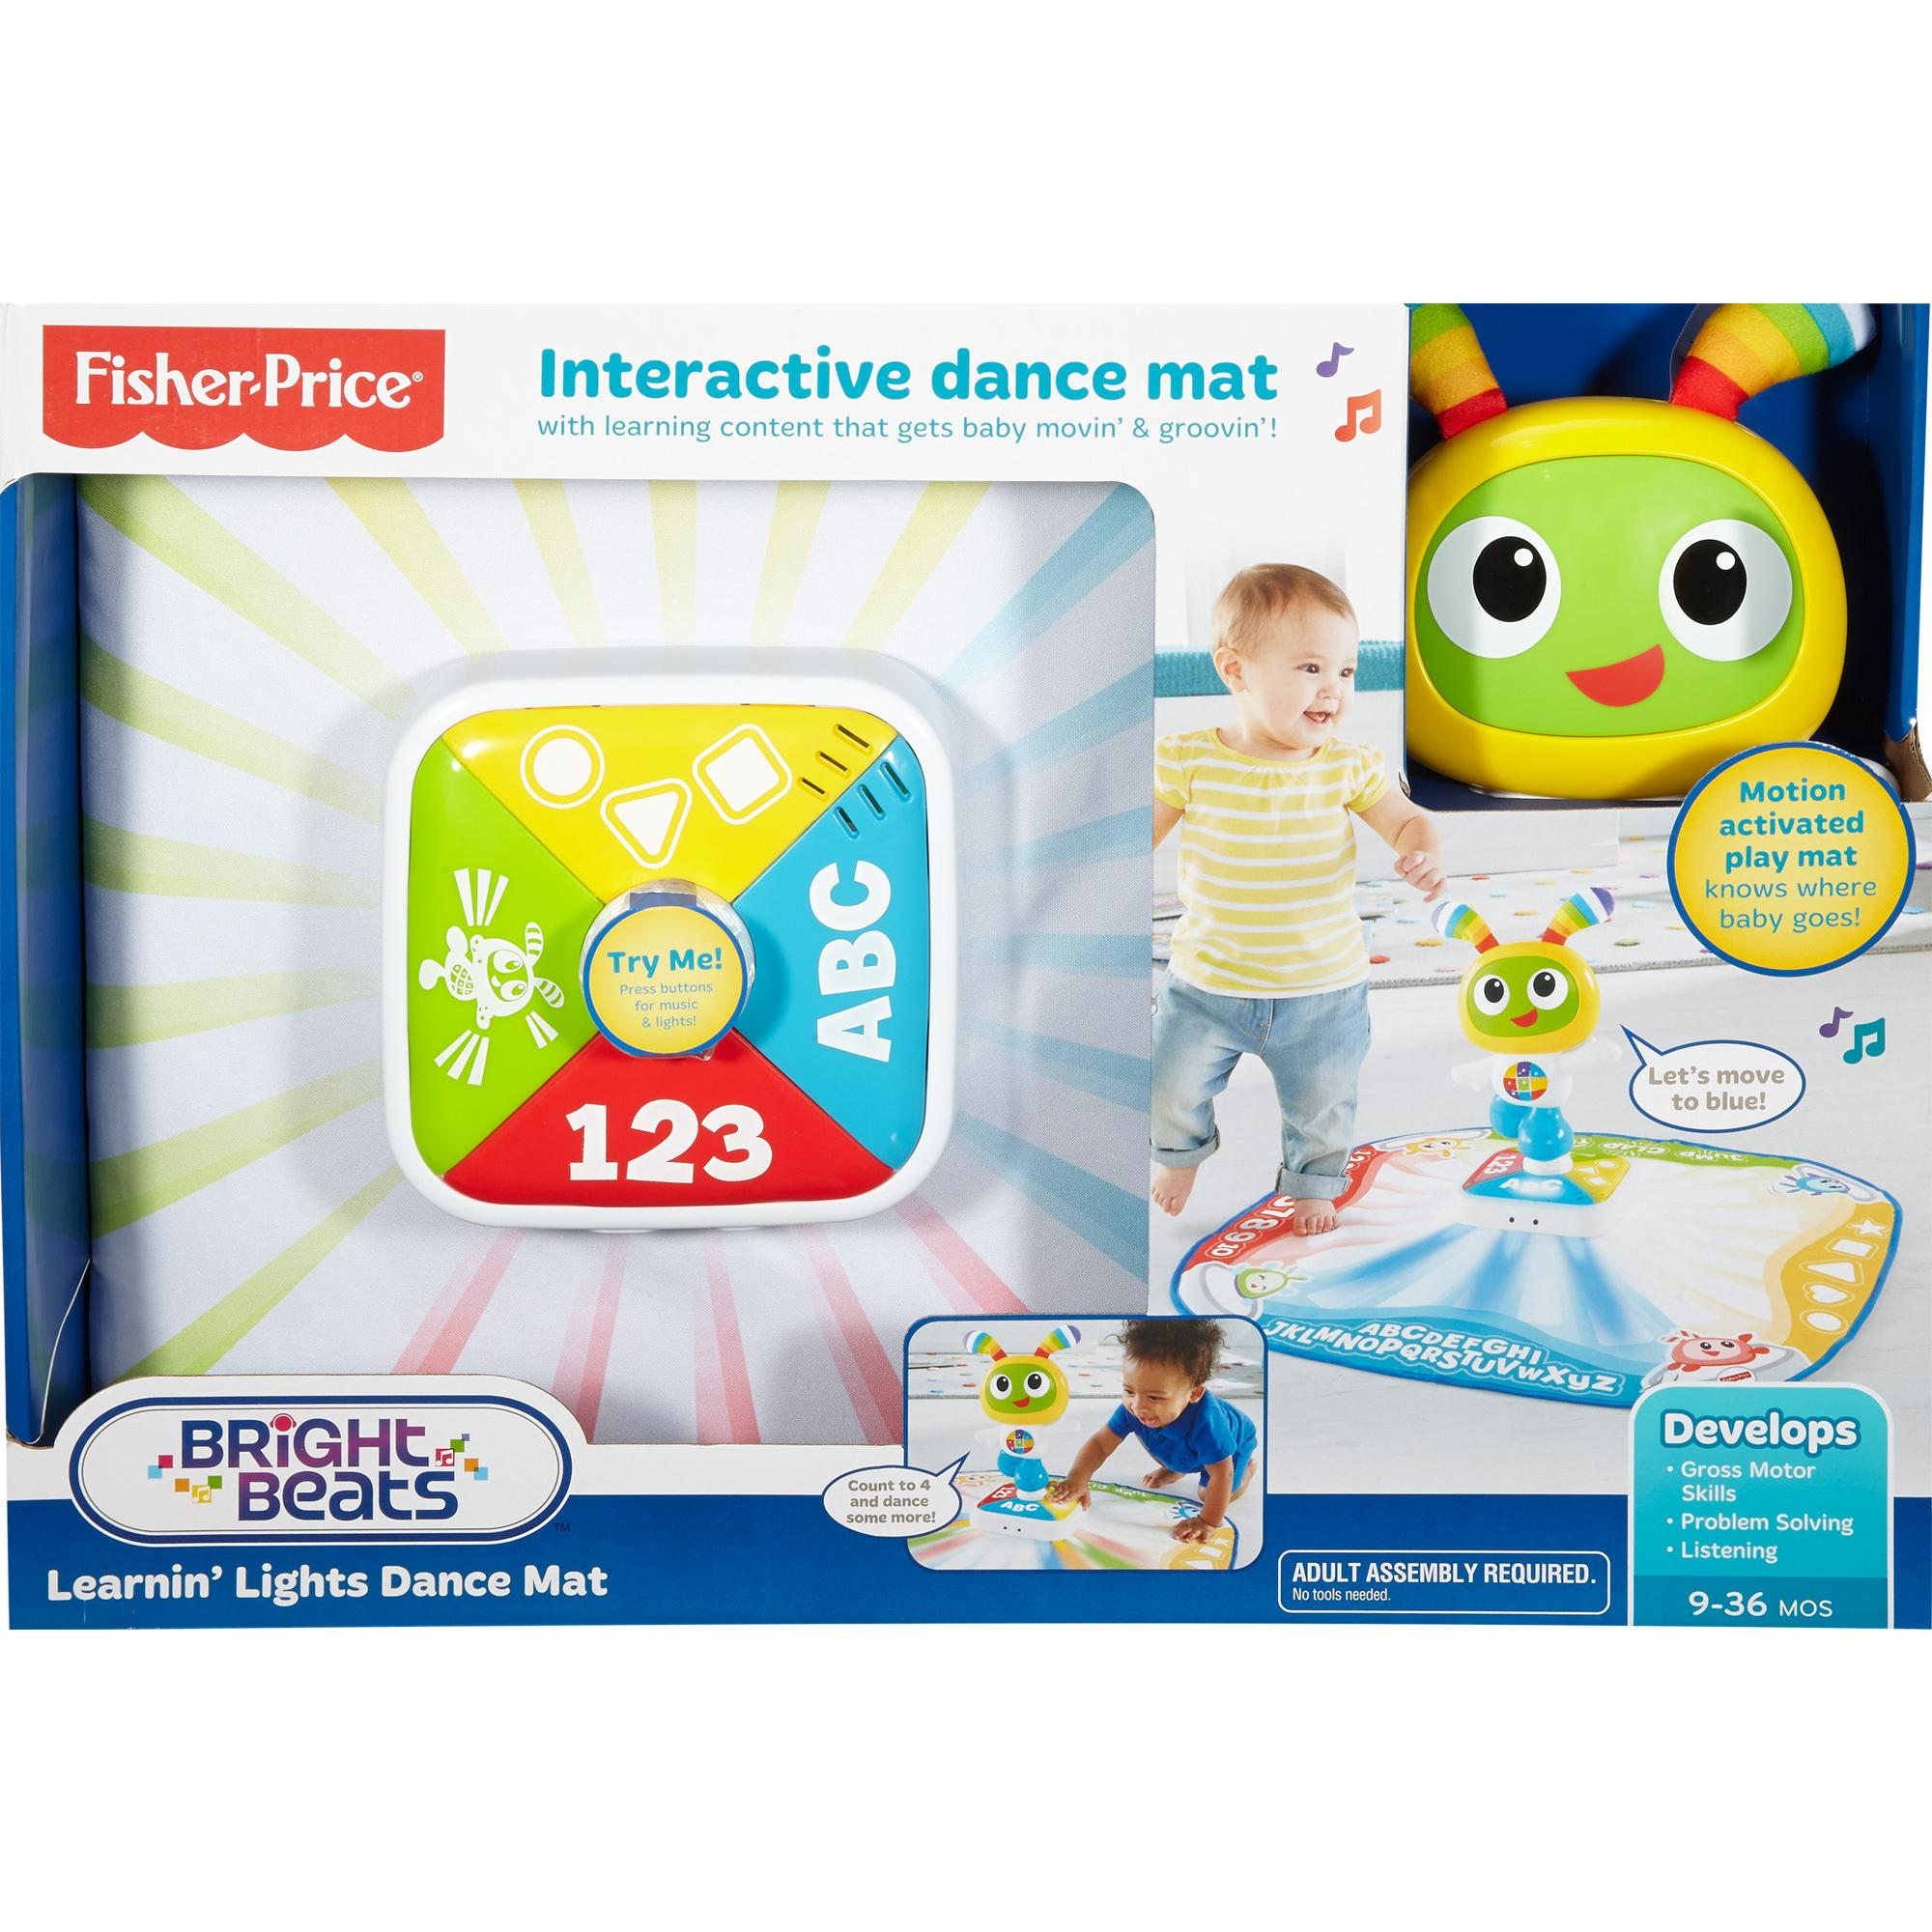 Fisher-Price Bright Beats Learnin' Lights Dance Mat - Walmart.com